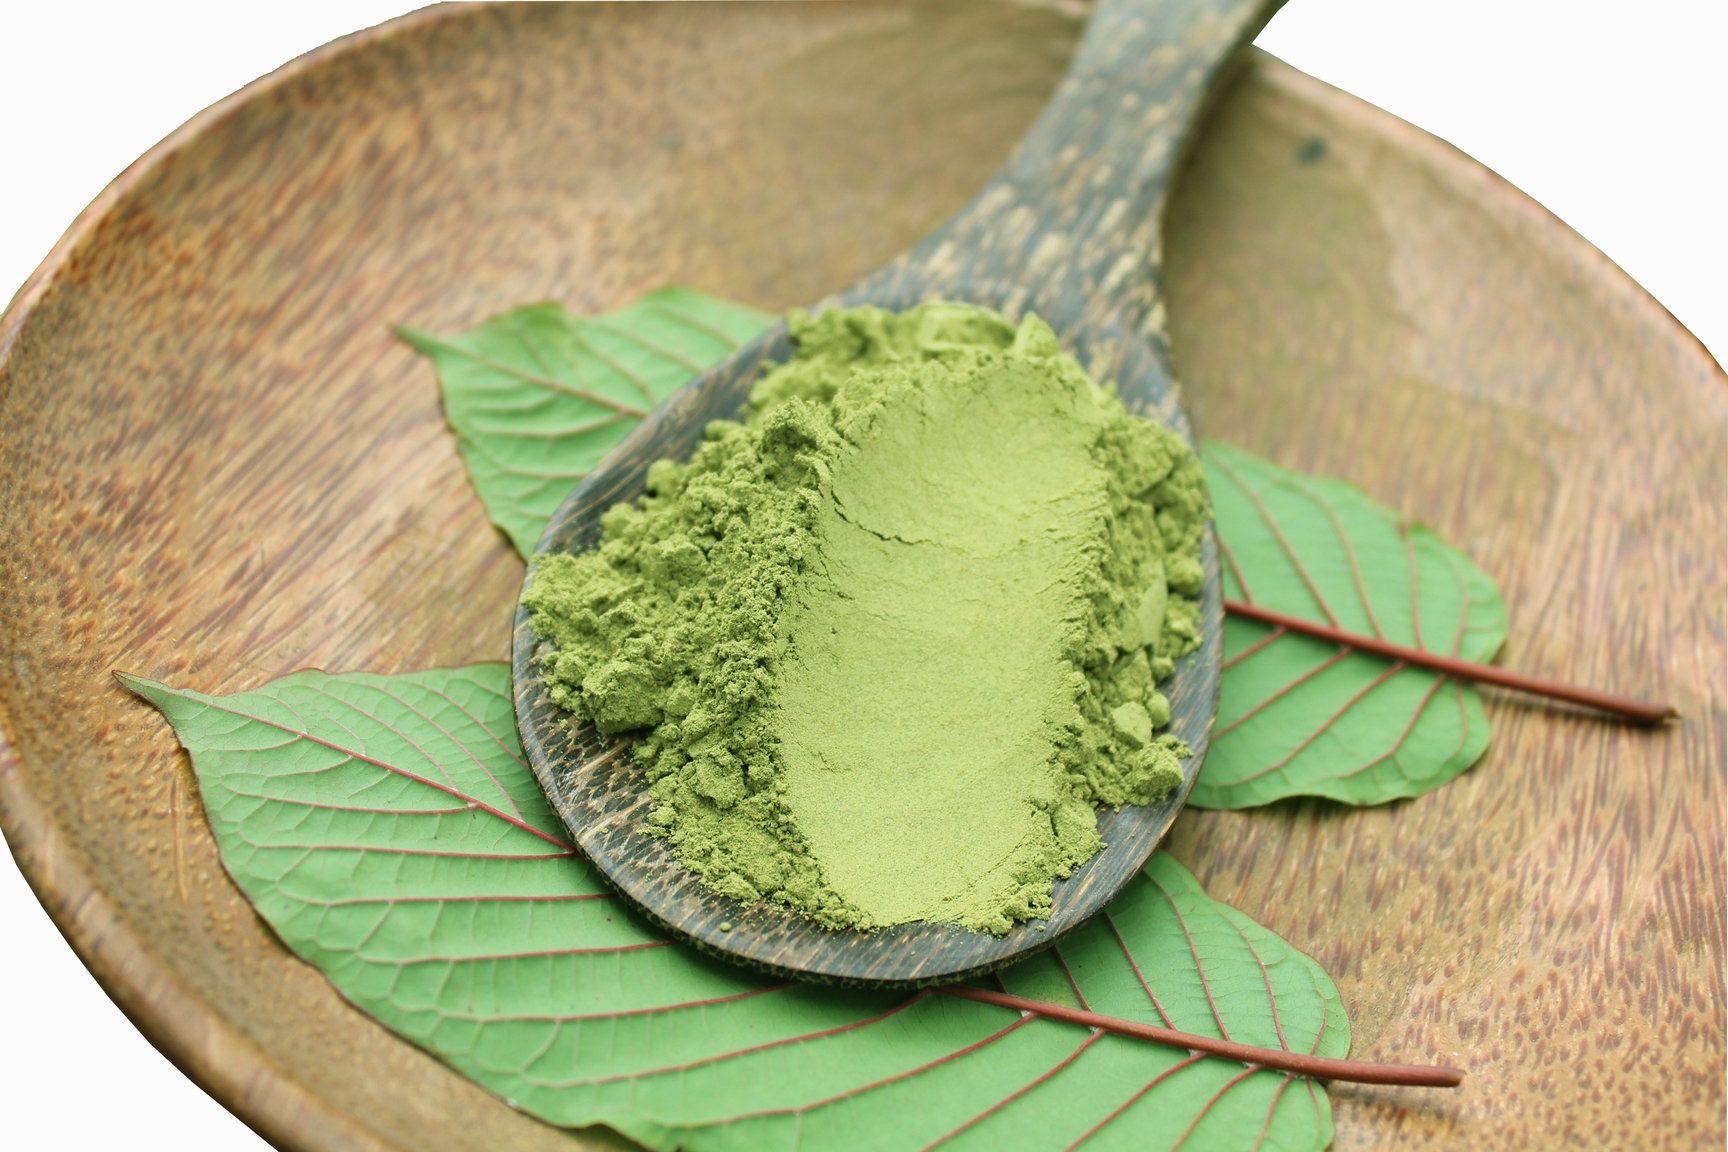 Red vein thai kratom review: Effects&Dosage